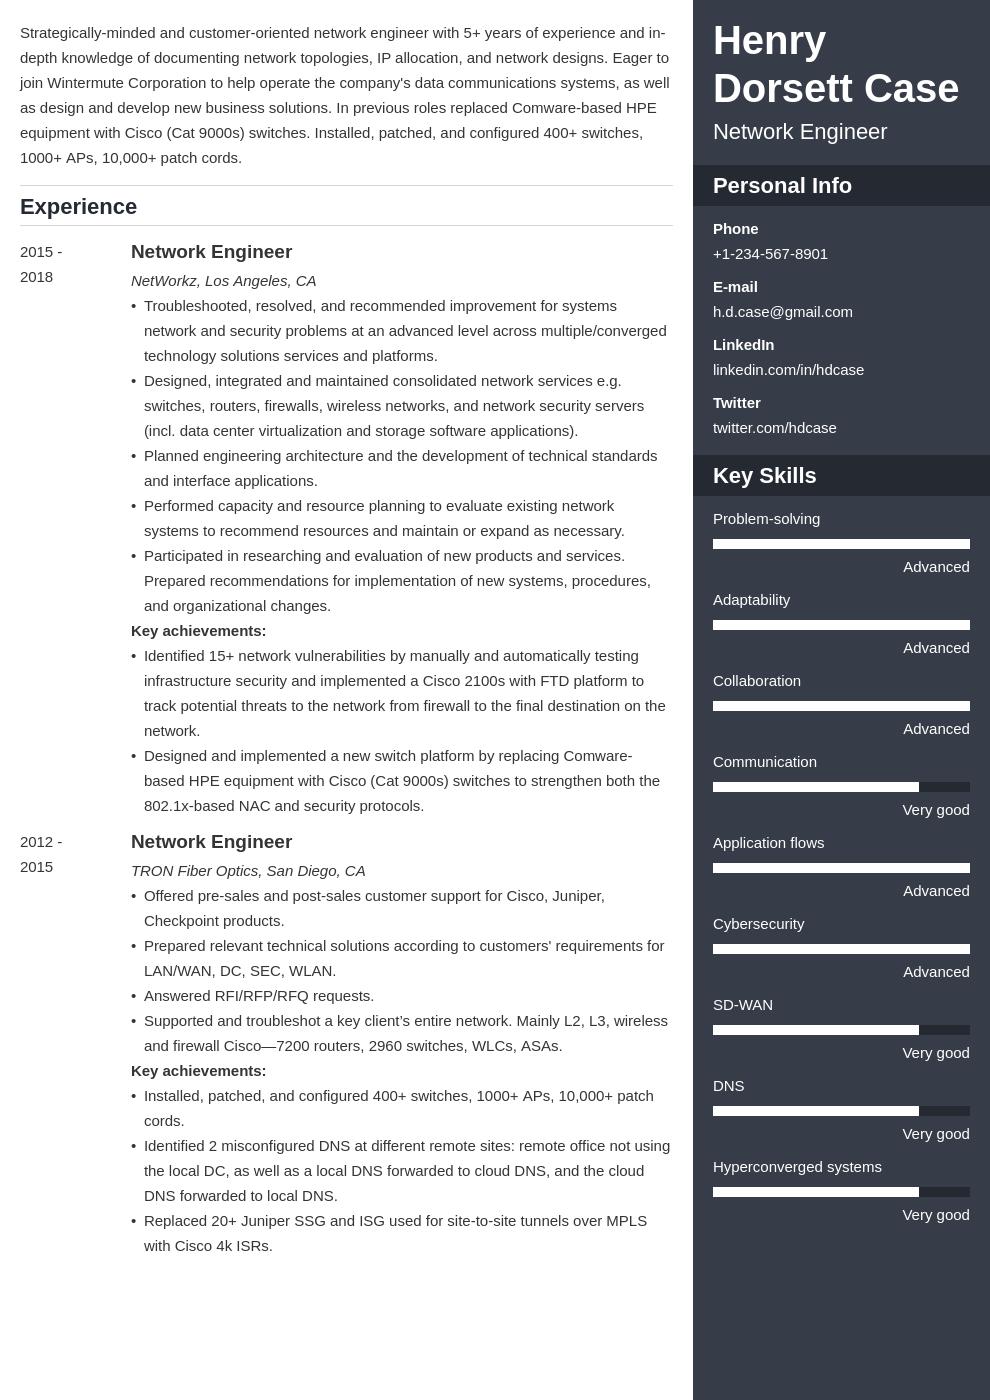 Basic Network Engineer Resume Cv Template Word Psd Indesign Apple Pages Illustrator Publisher Engineering Resume Templates Basic Resume Engineering Resume